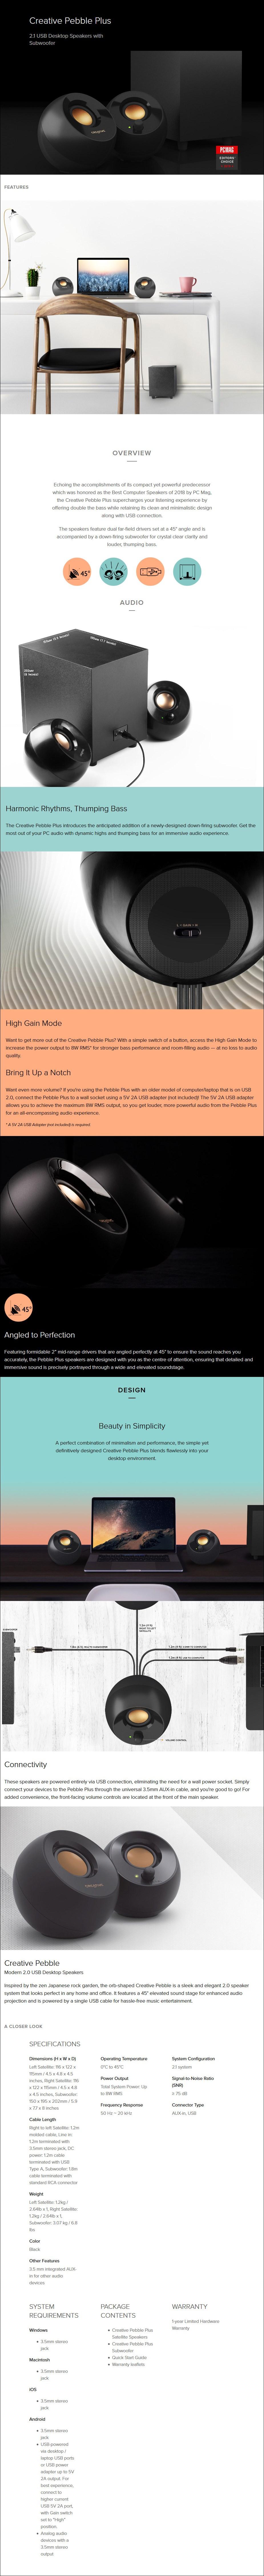 Creative Pebble Plus 2.1 USB Speaker System - Black - Desktop Overview 1